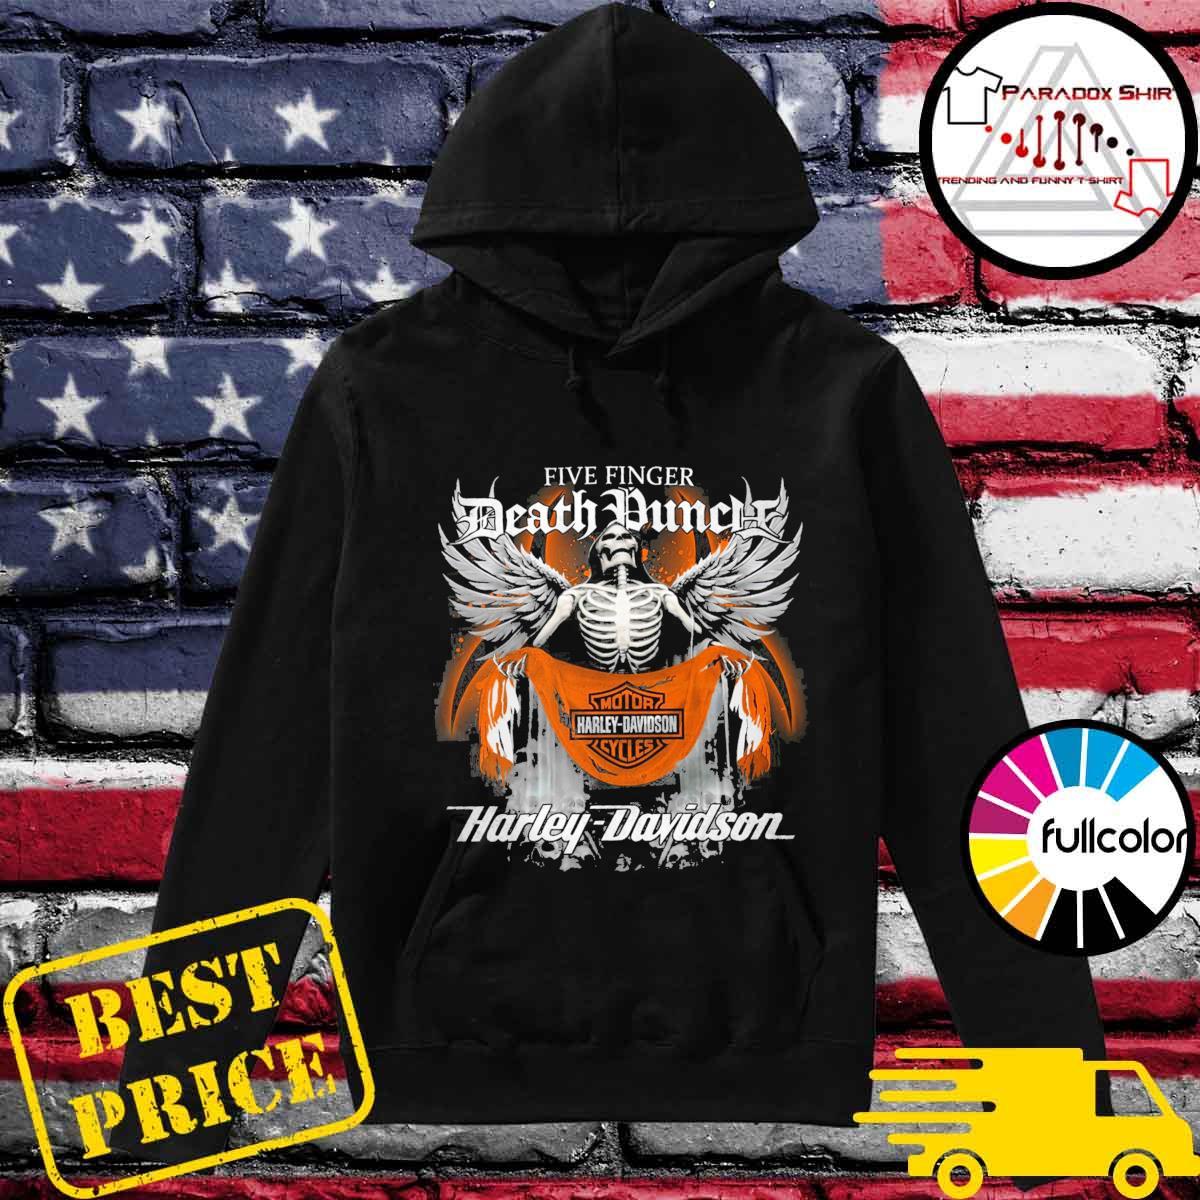 Five Finger Death Punch Motor harley Davidson Cycles Harley Davidson s Hoodie